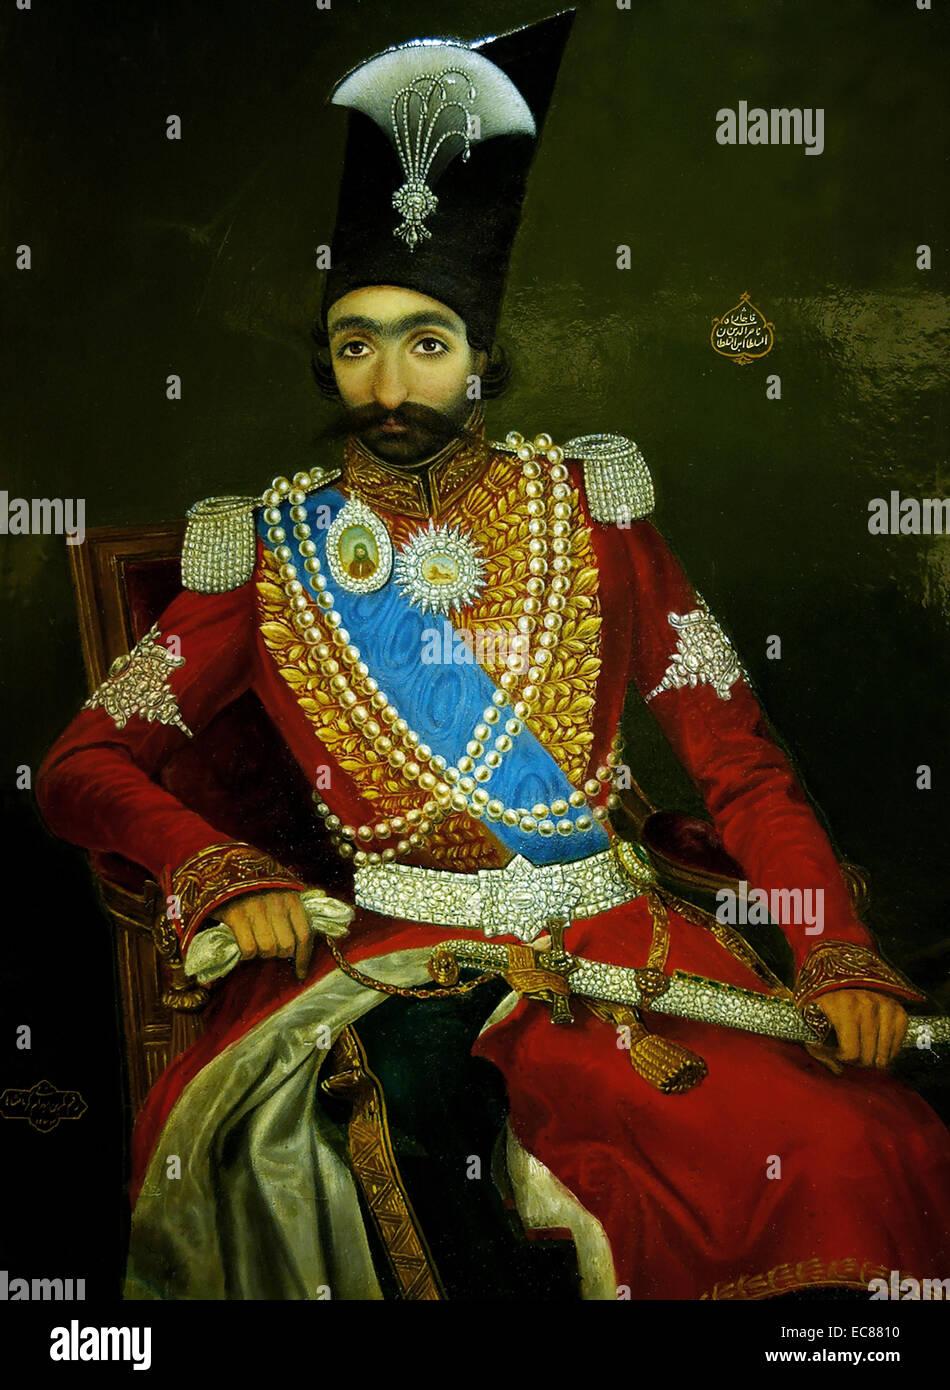 Portrait of Nasser al-Din Shah Qajar (1831-1896) King of Persia. Dated 1841 - Stock Image